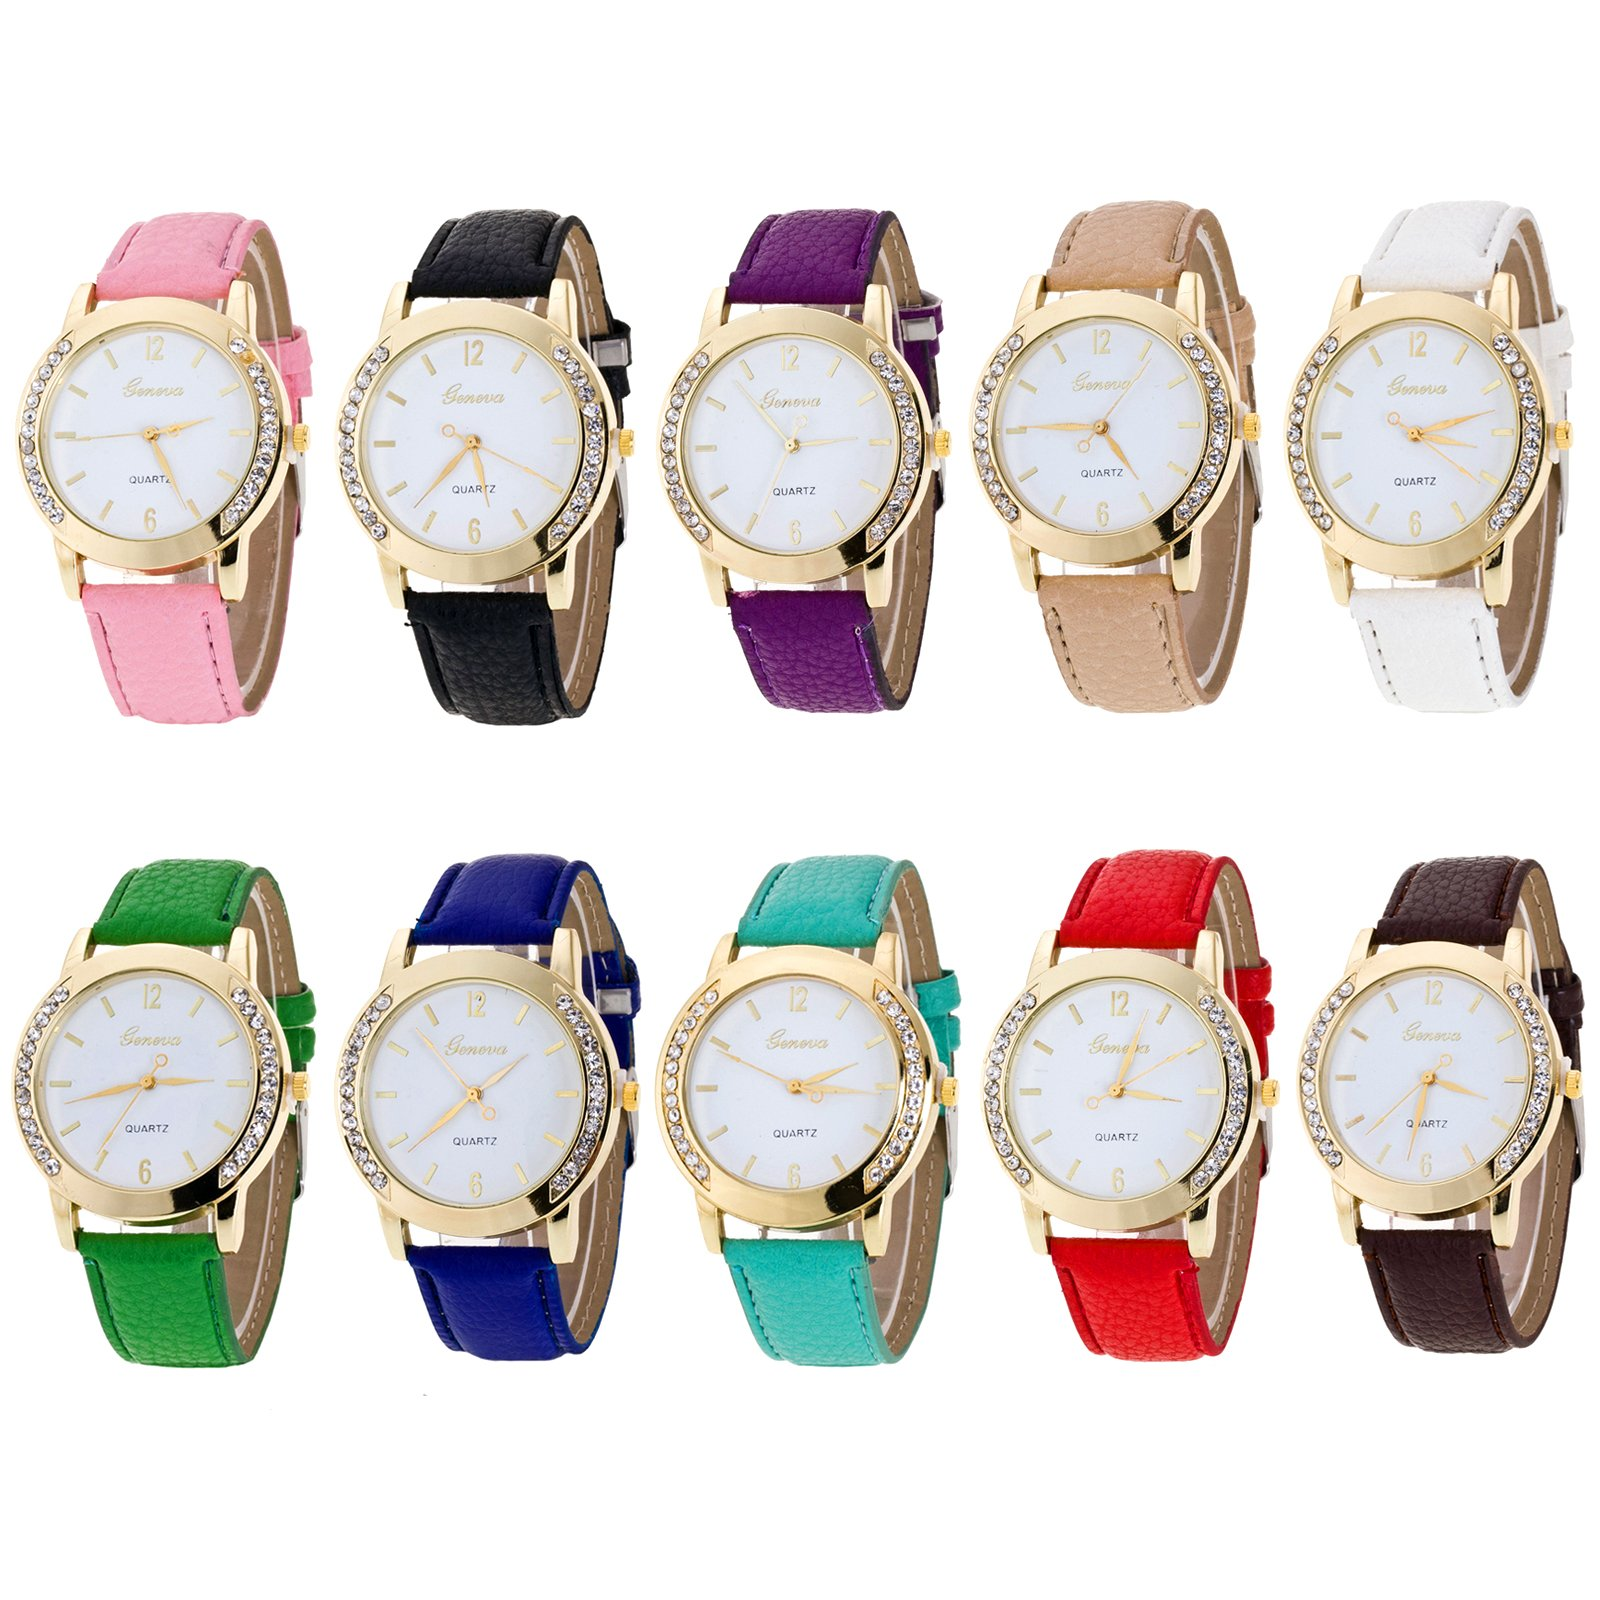 Geneva Women's Wholesale 10 Pcs Wholesale Women Watches Leather Rhinestone Inlaid Quartz Jelly Dress Wristwatch (10PACK) by NYKKOLA